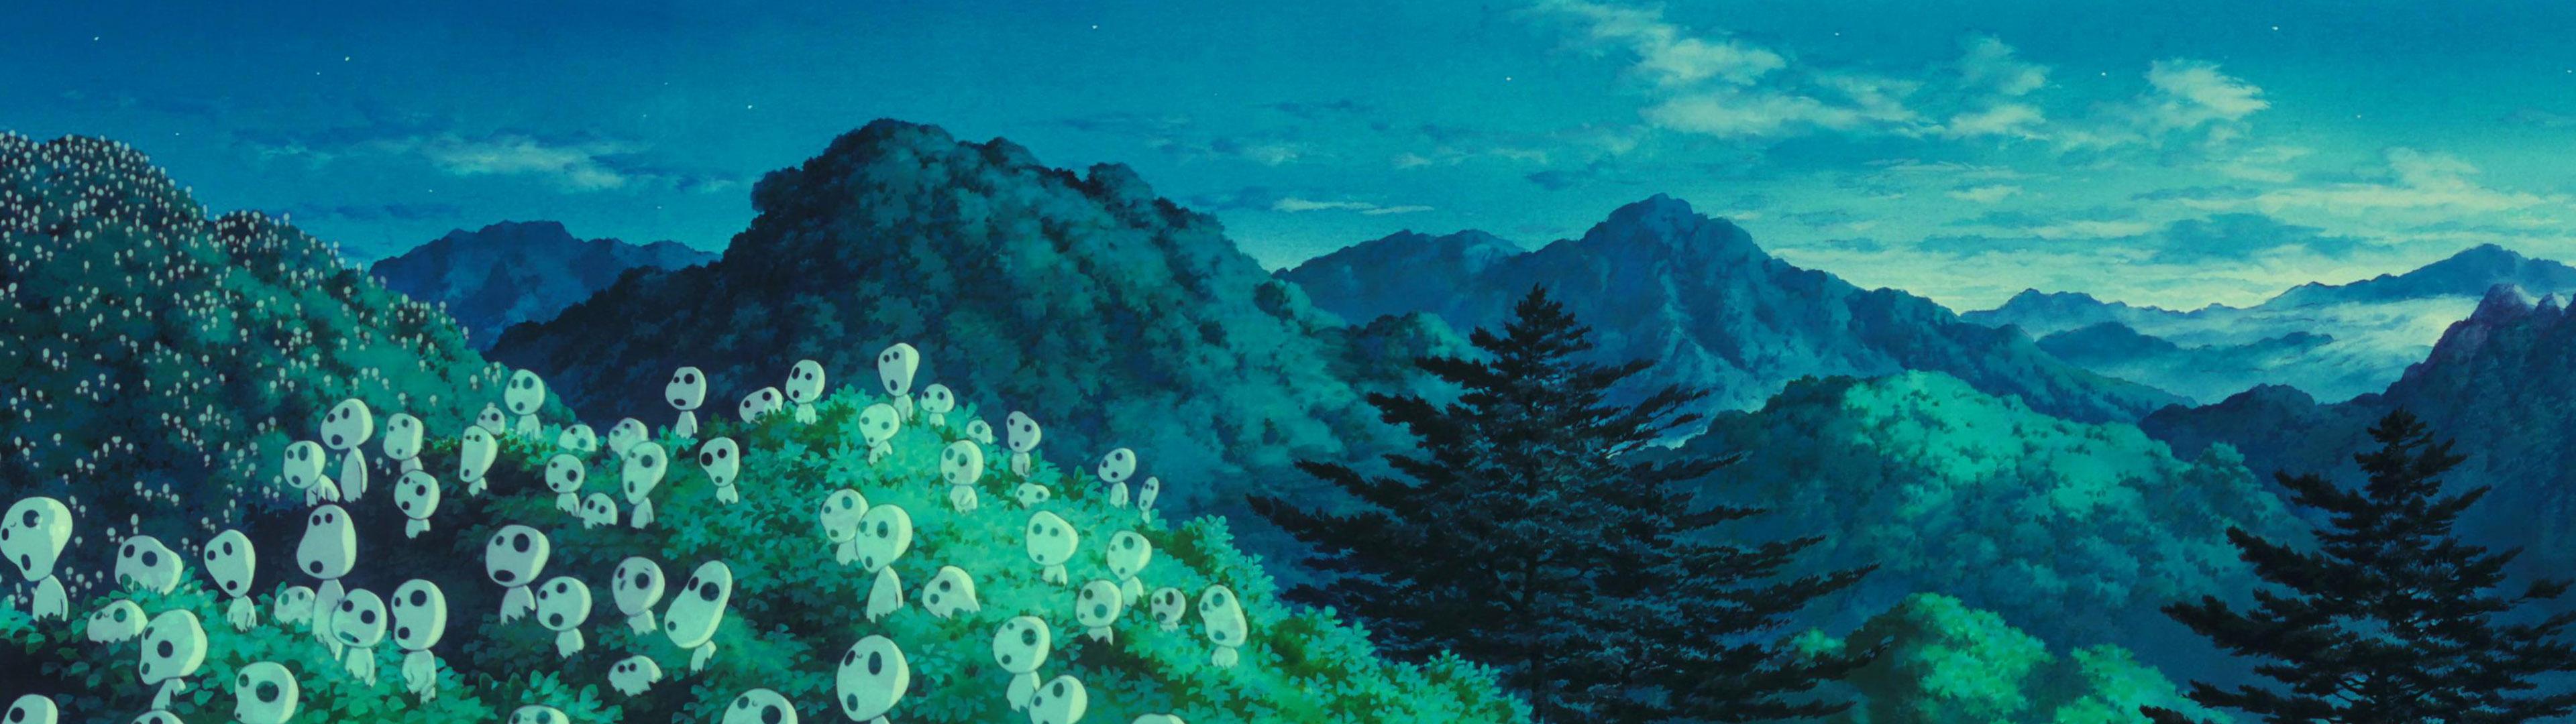 Dual Monitor Kodama Princess Mononoke Wallpaper 3840x1080